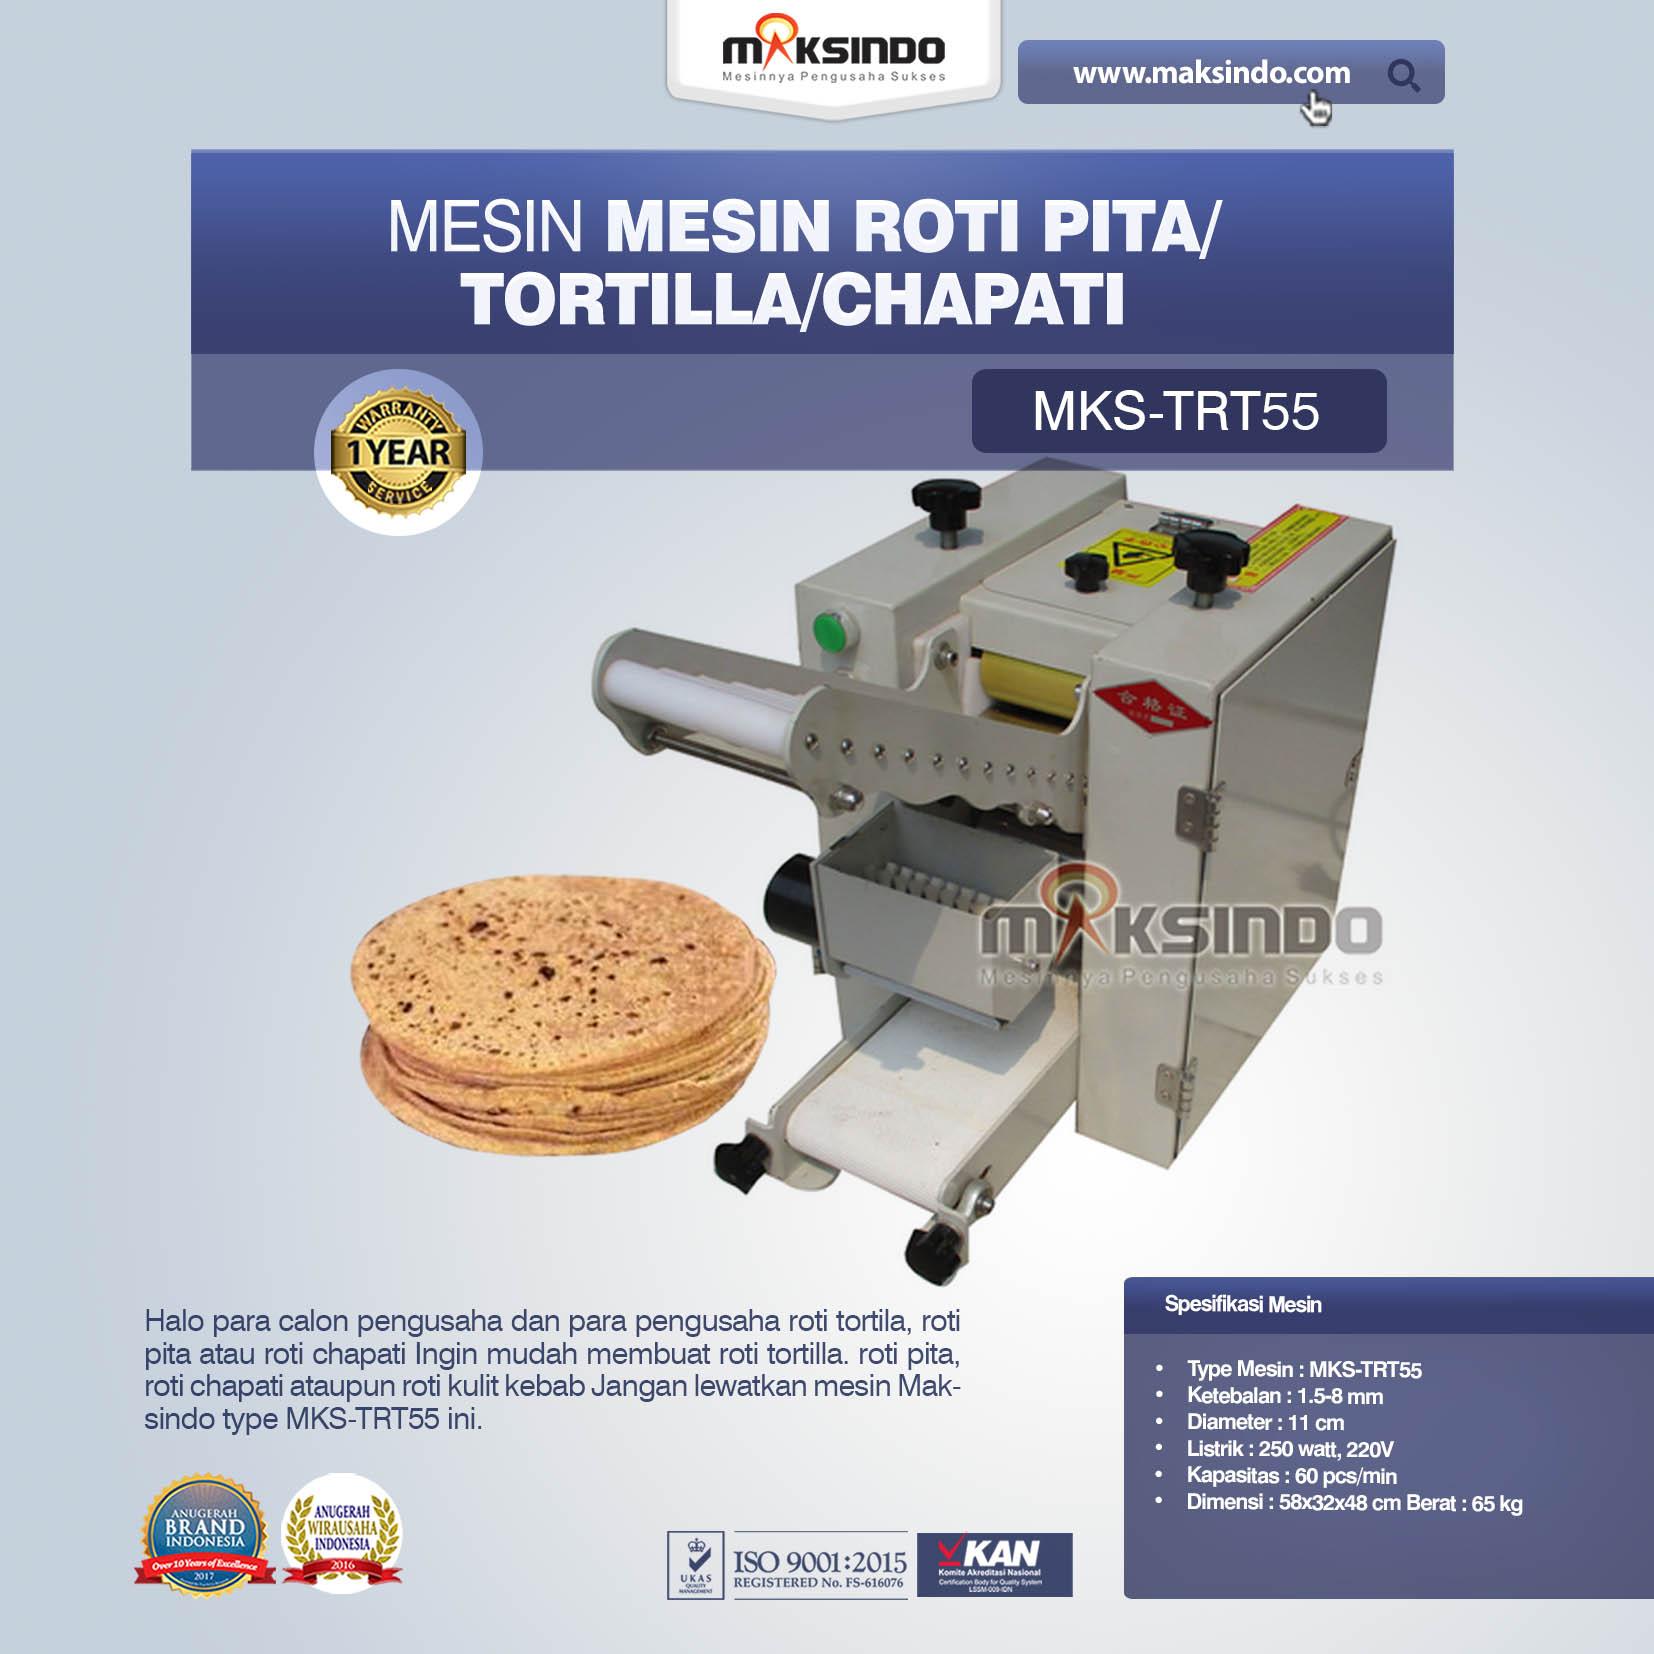 Jual Mesin Roti Pita/Tortilla/Chapati MKS-TRT55 Di Bali